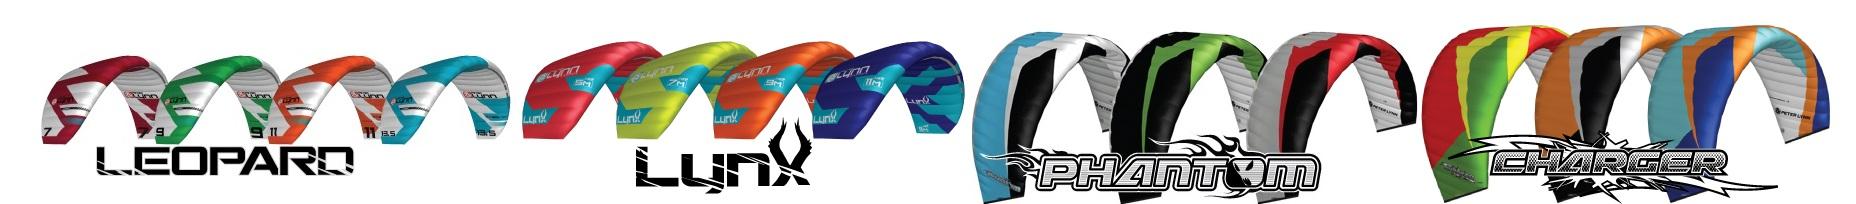 kitsurf Depower Foils